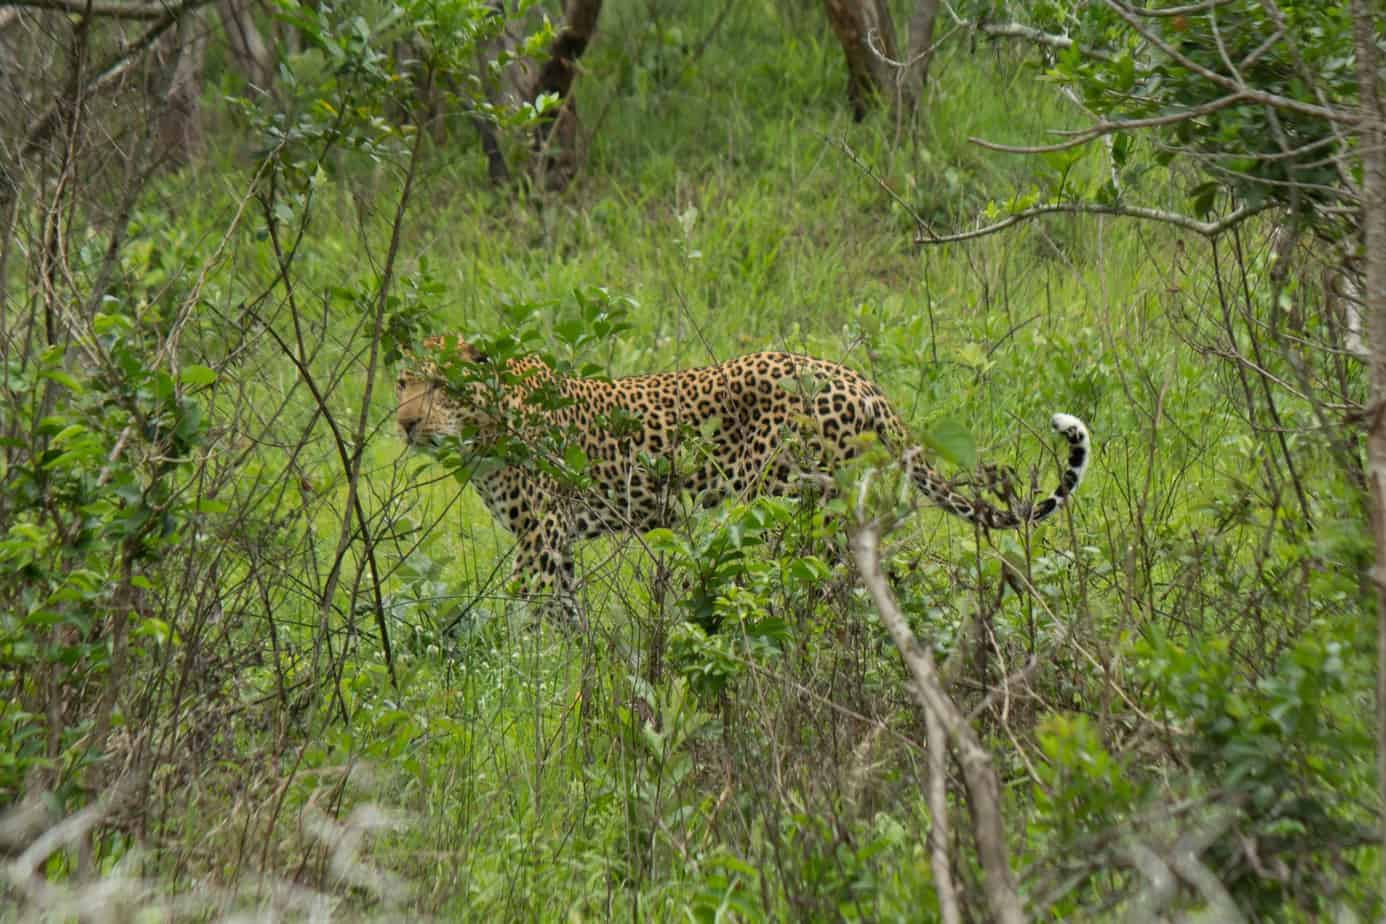 Leopard @ Eastern Shores - iSimangaliso Wetland Park. Photo: Håvard Rosenlund